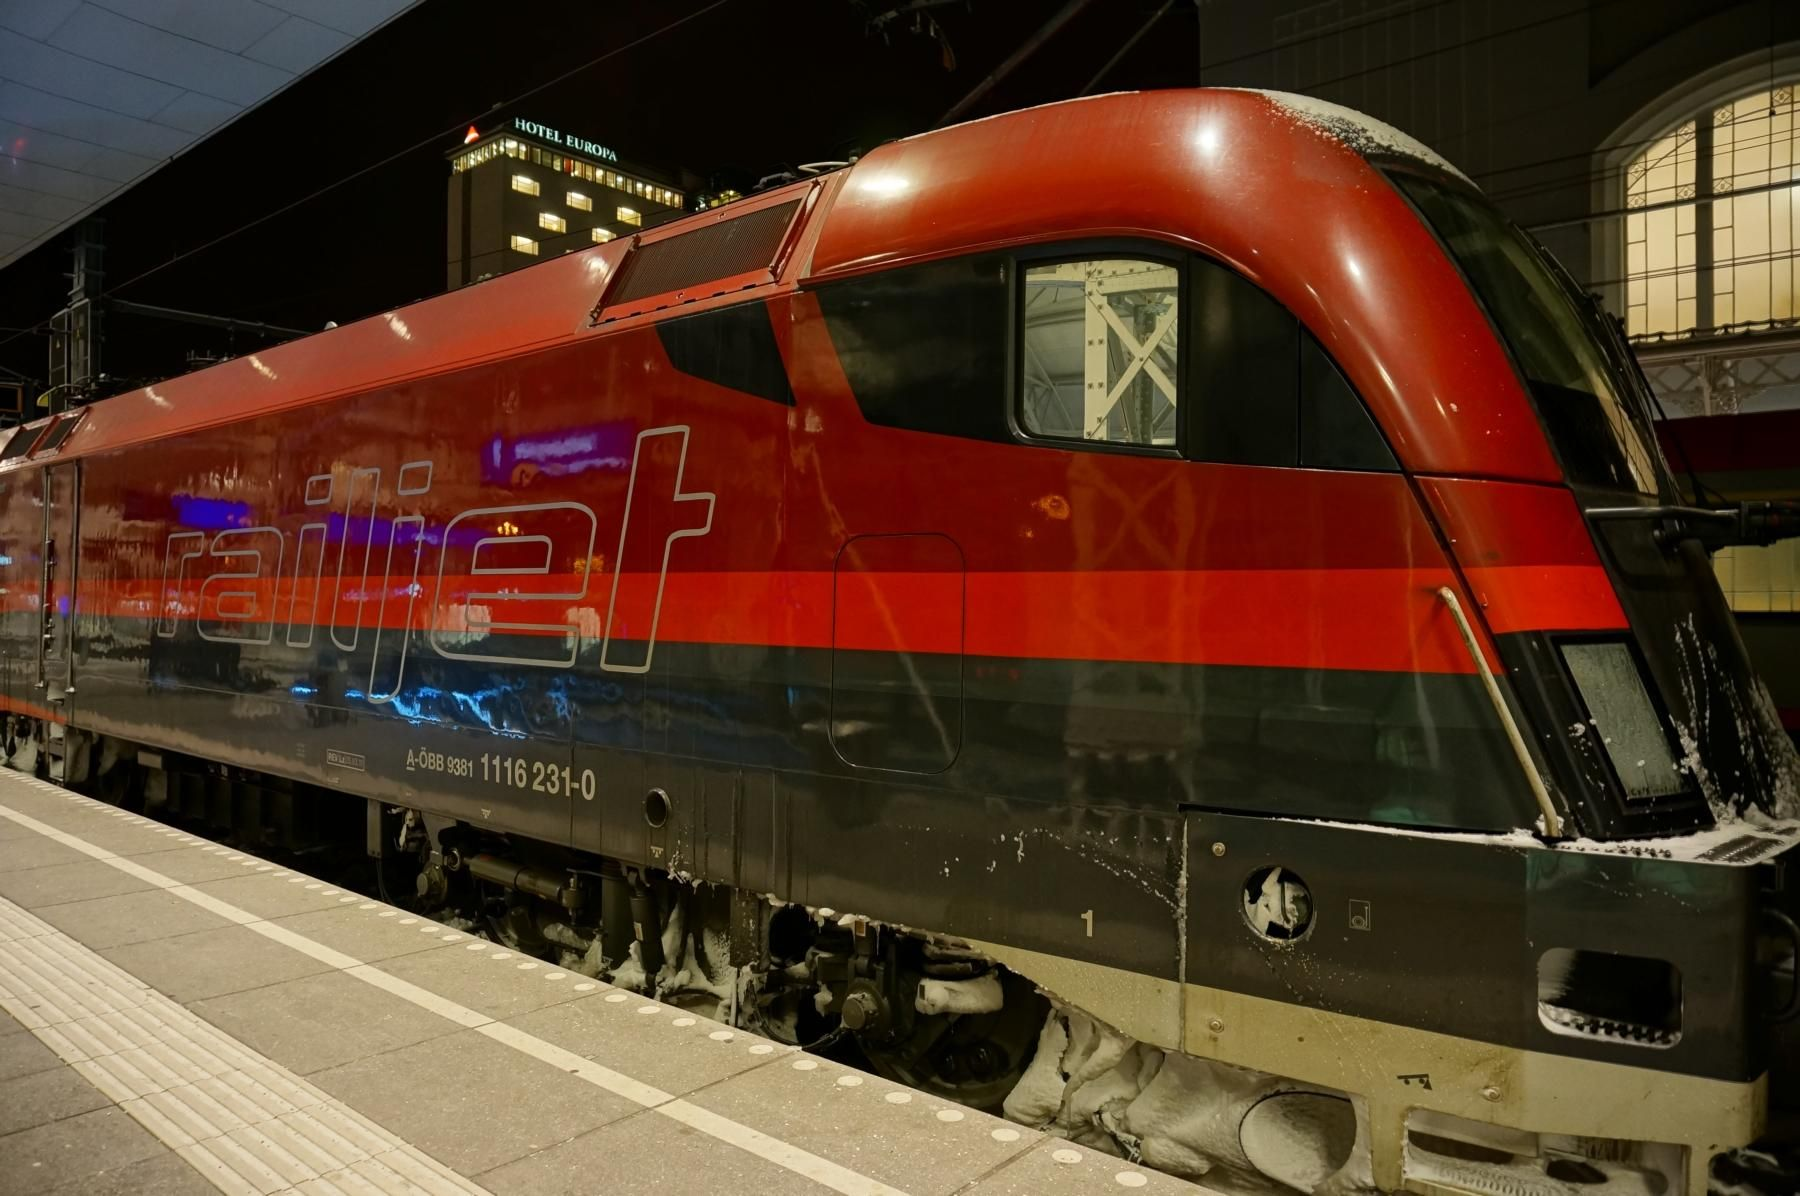 Switzerland High Speed Train - HDR Editorial Stock Photo